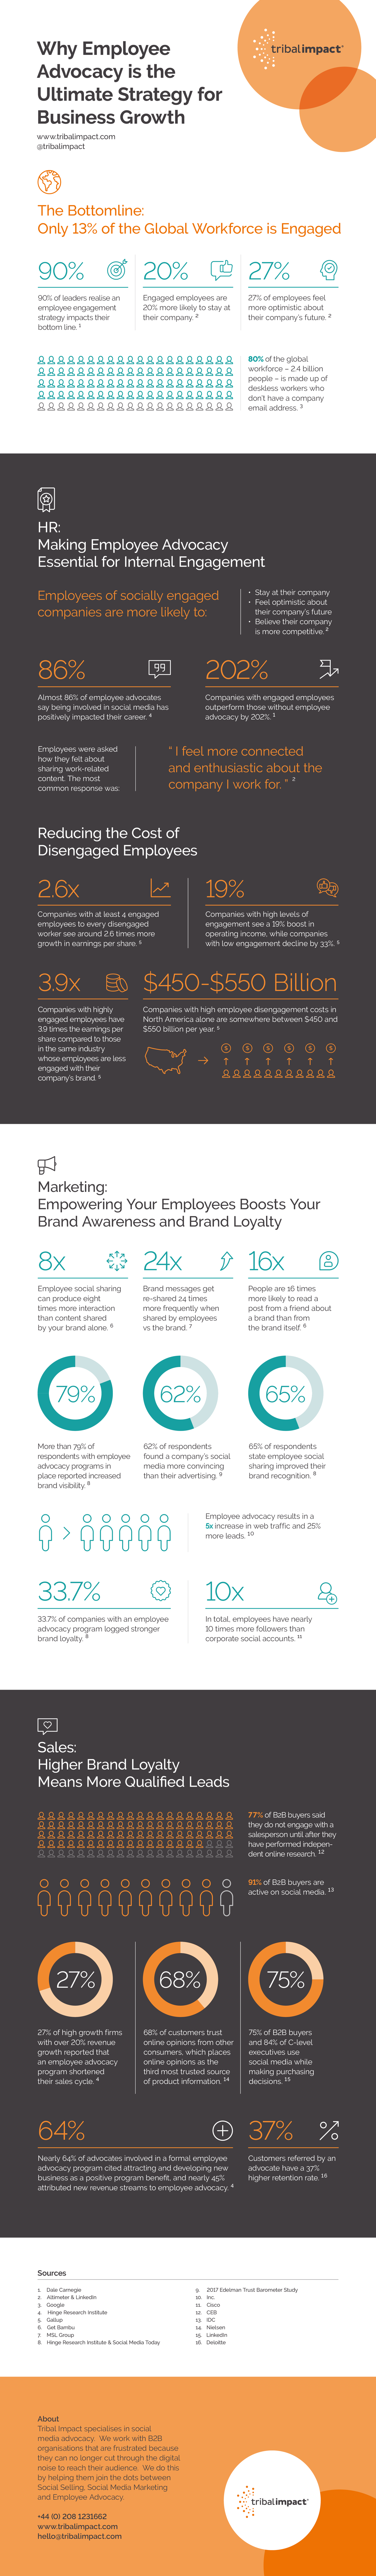 Employee_Advocacy_Infographic_V2